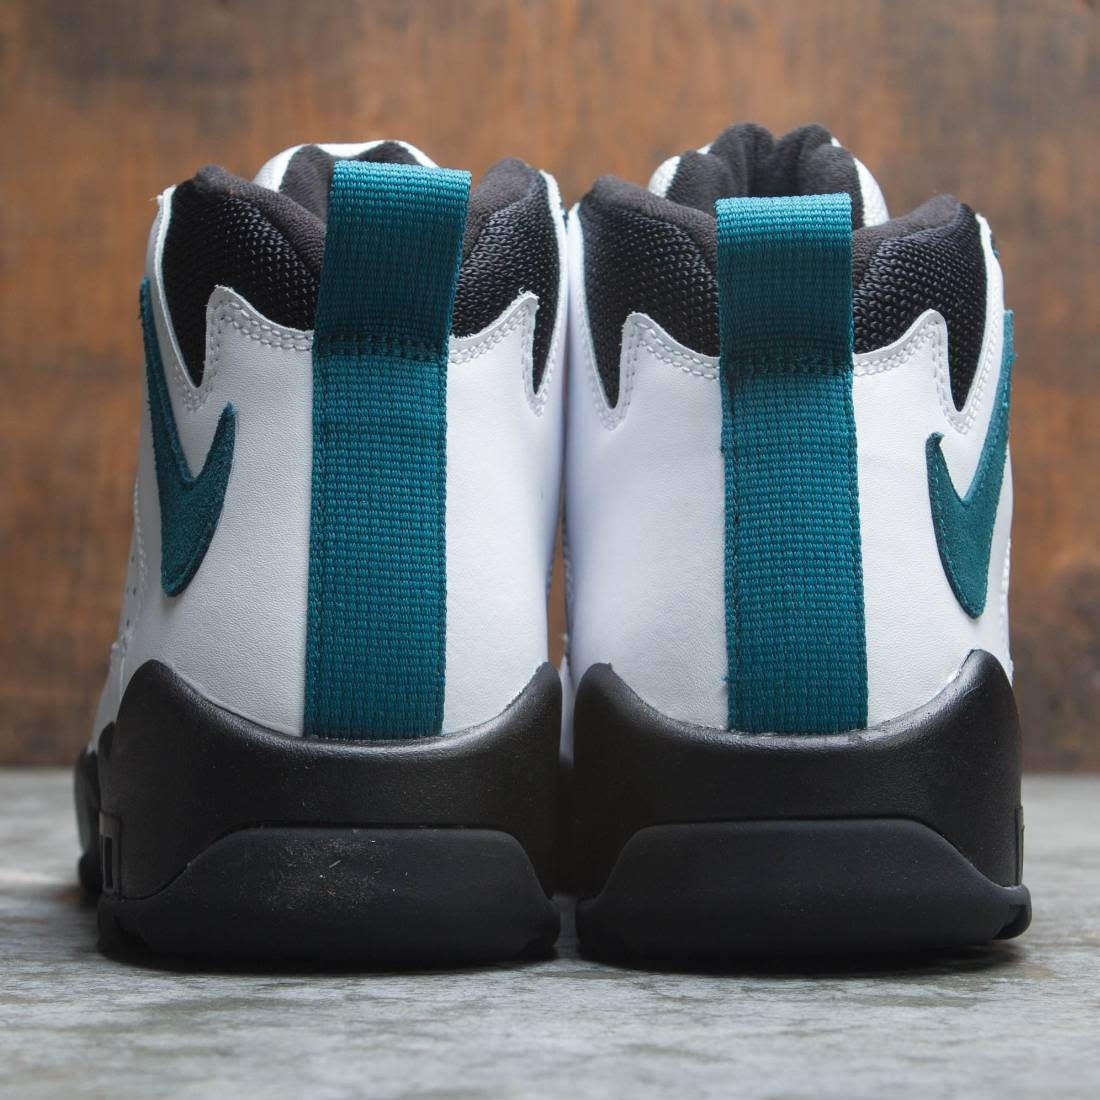 hot sale online 39b94 745f7 Nike-Air-Darwin-OG-White-Teal-Black-4